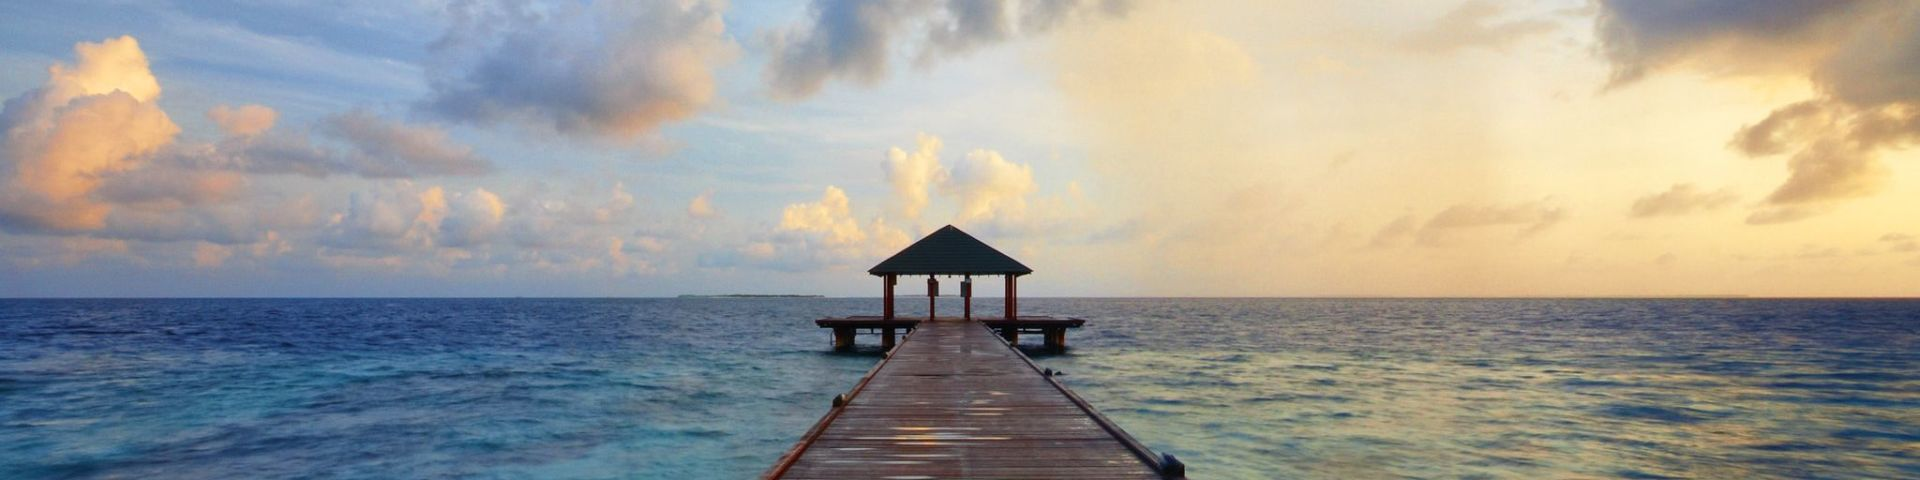 Erholung auf den Malediven